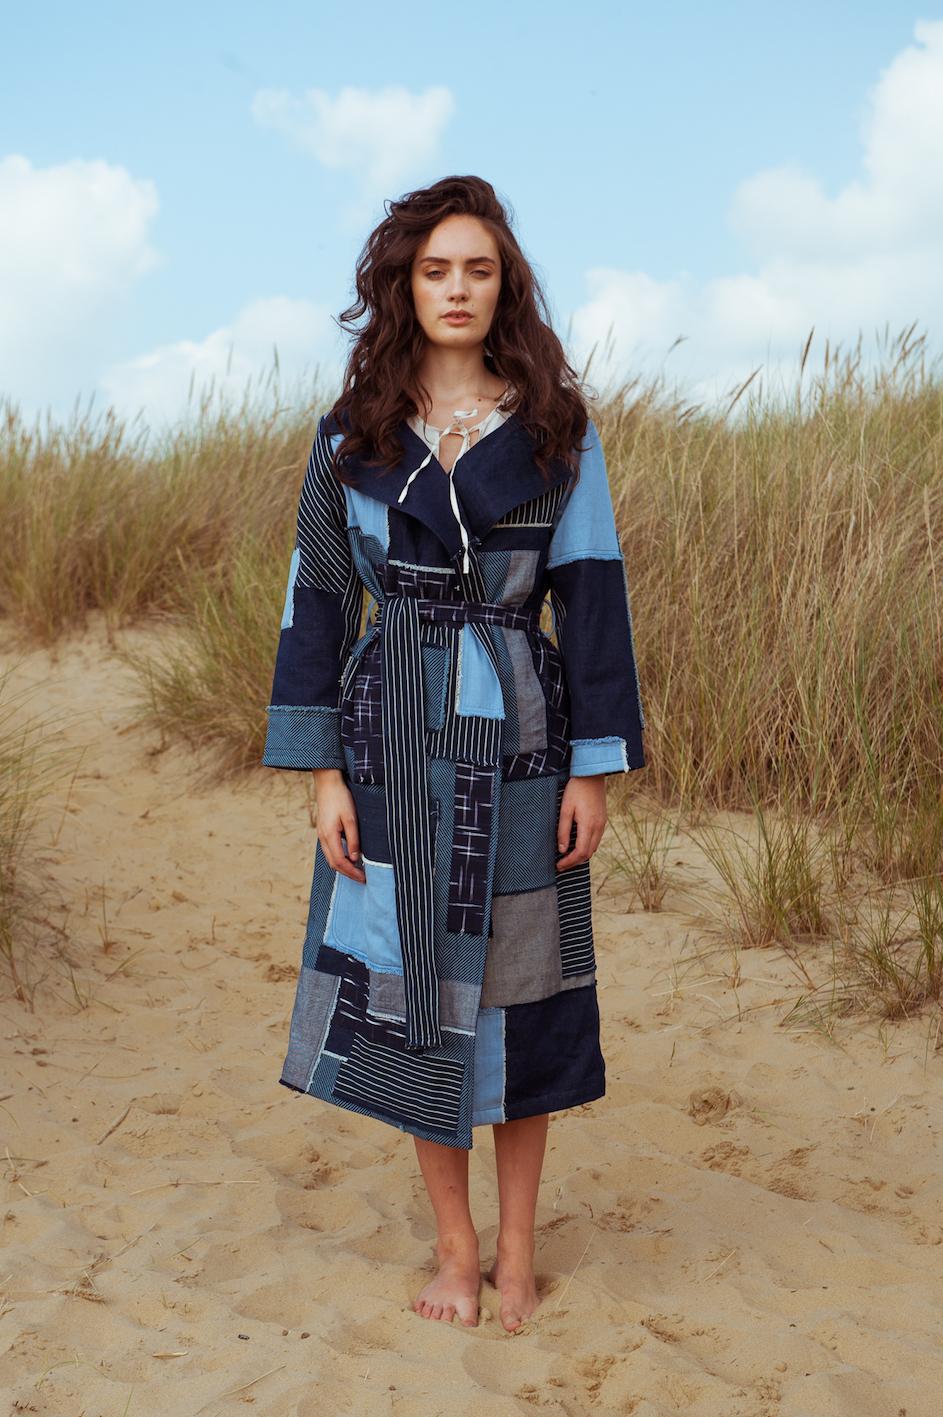 Oshadi lookbook, denim dress